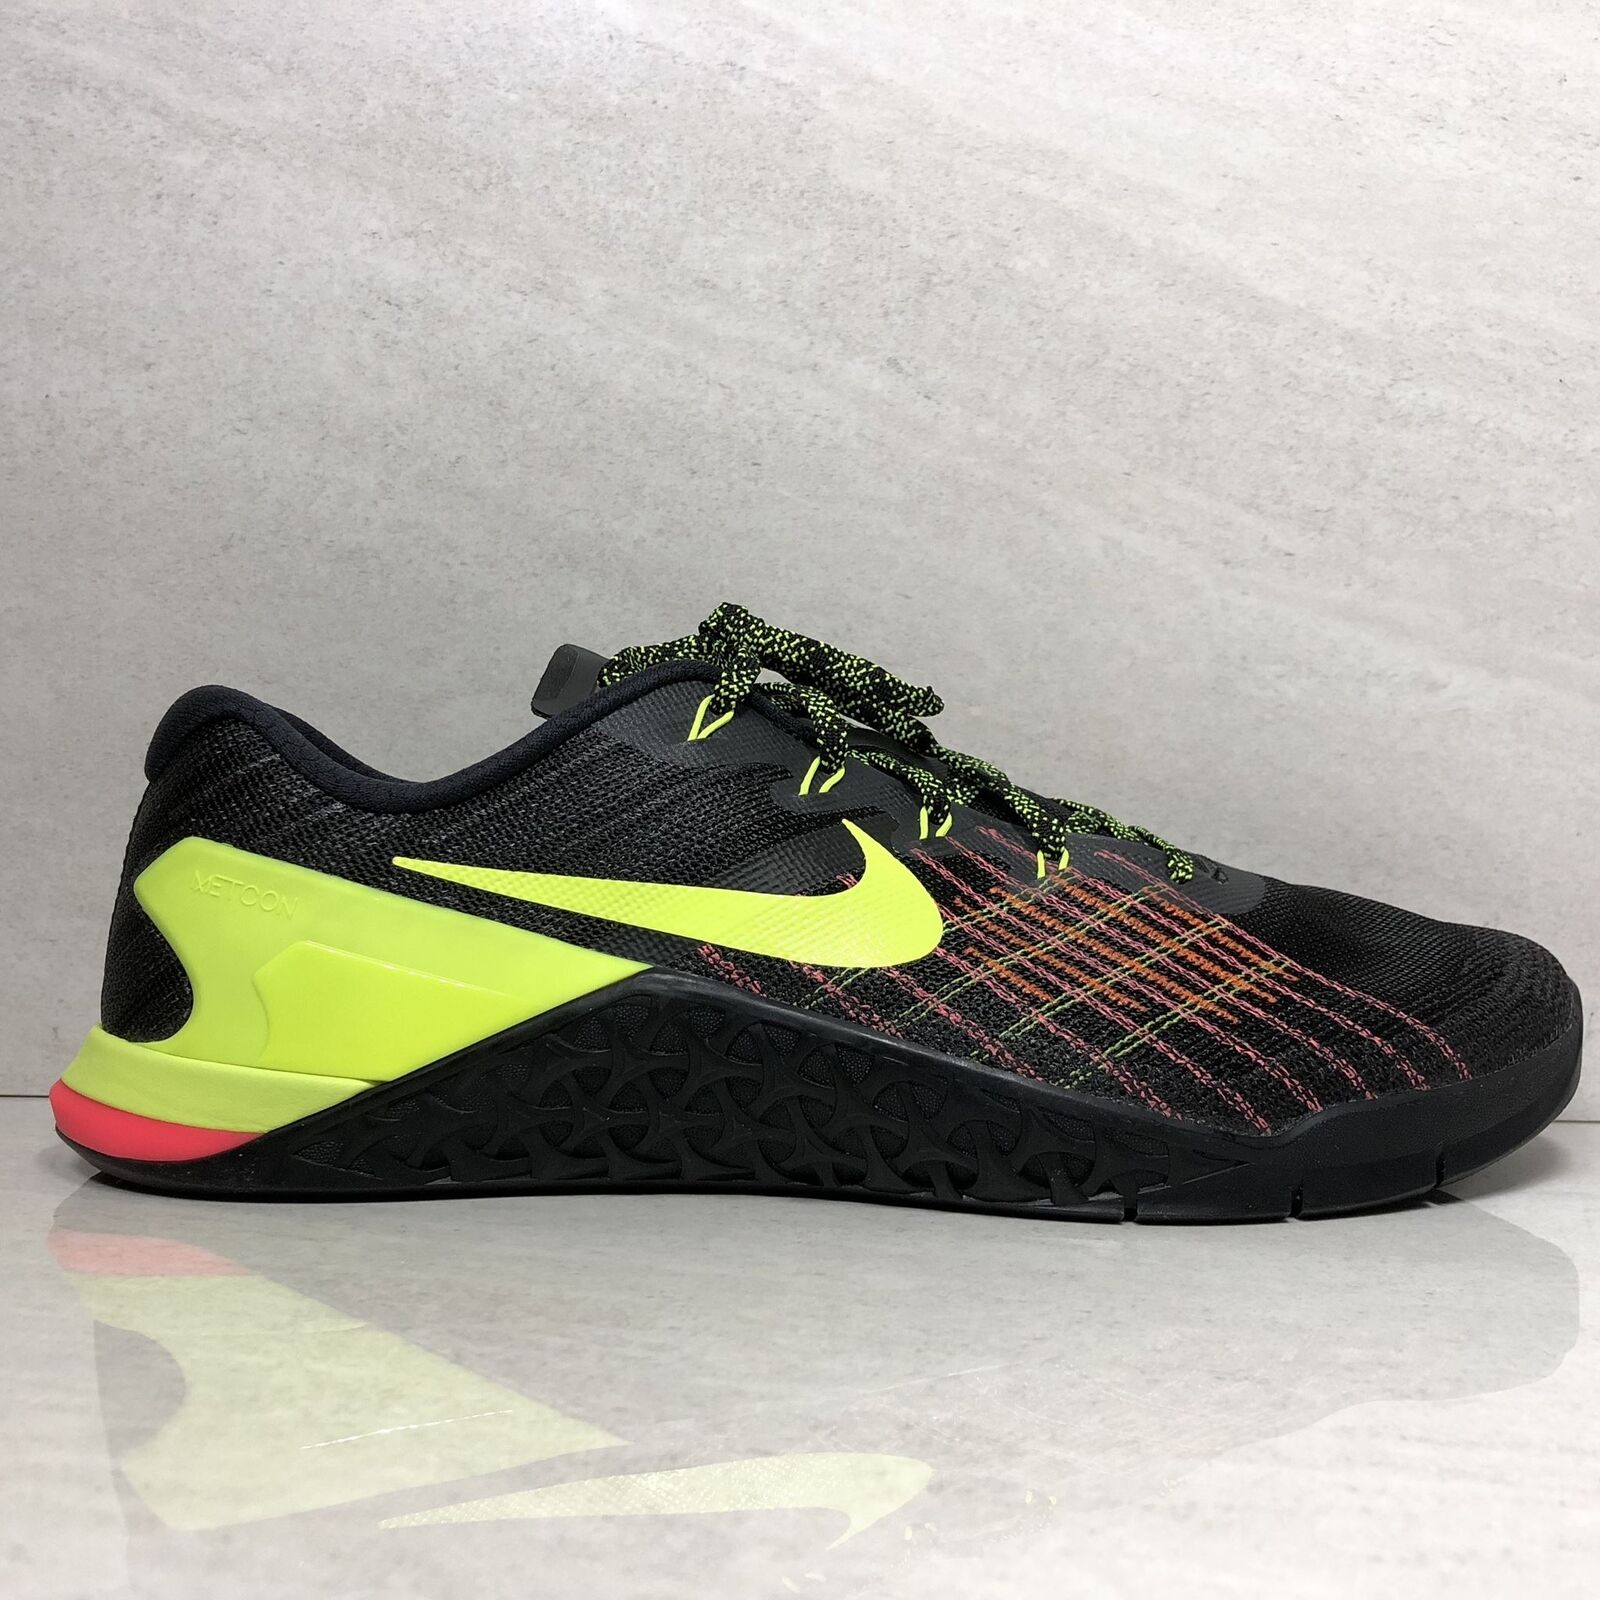 Nike Men's Metcon 3 Training Shoe Men's Size 14 BLACK/VOLT-HYPER CRIM